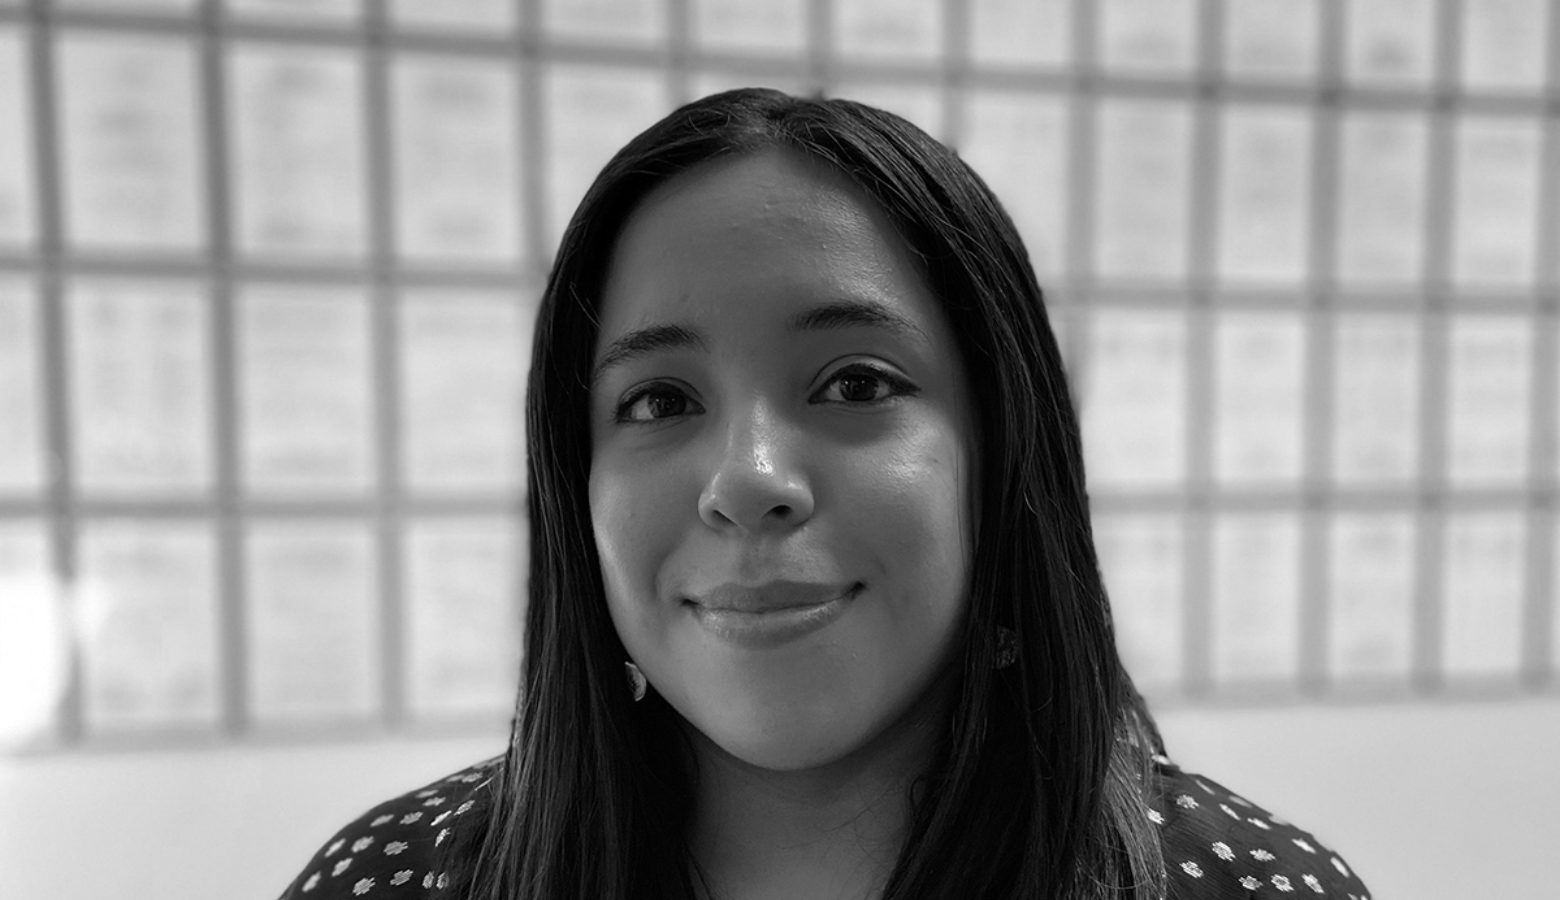 In the Spotlight: Sasha Montes de Oca